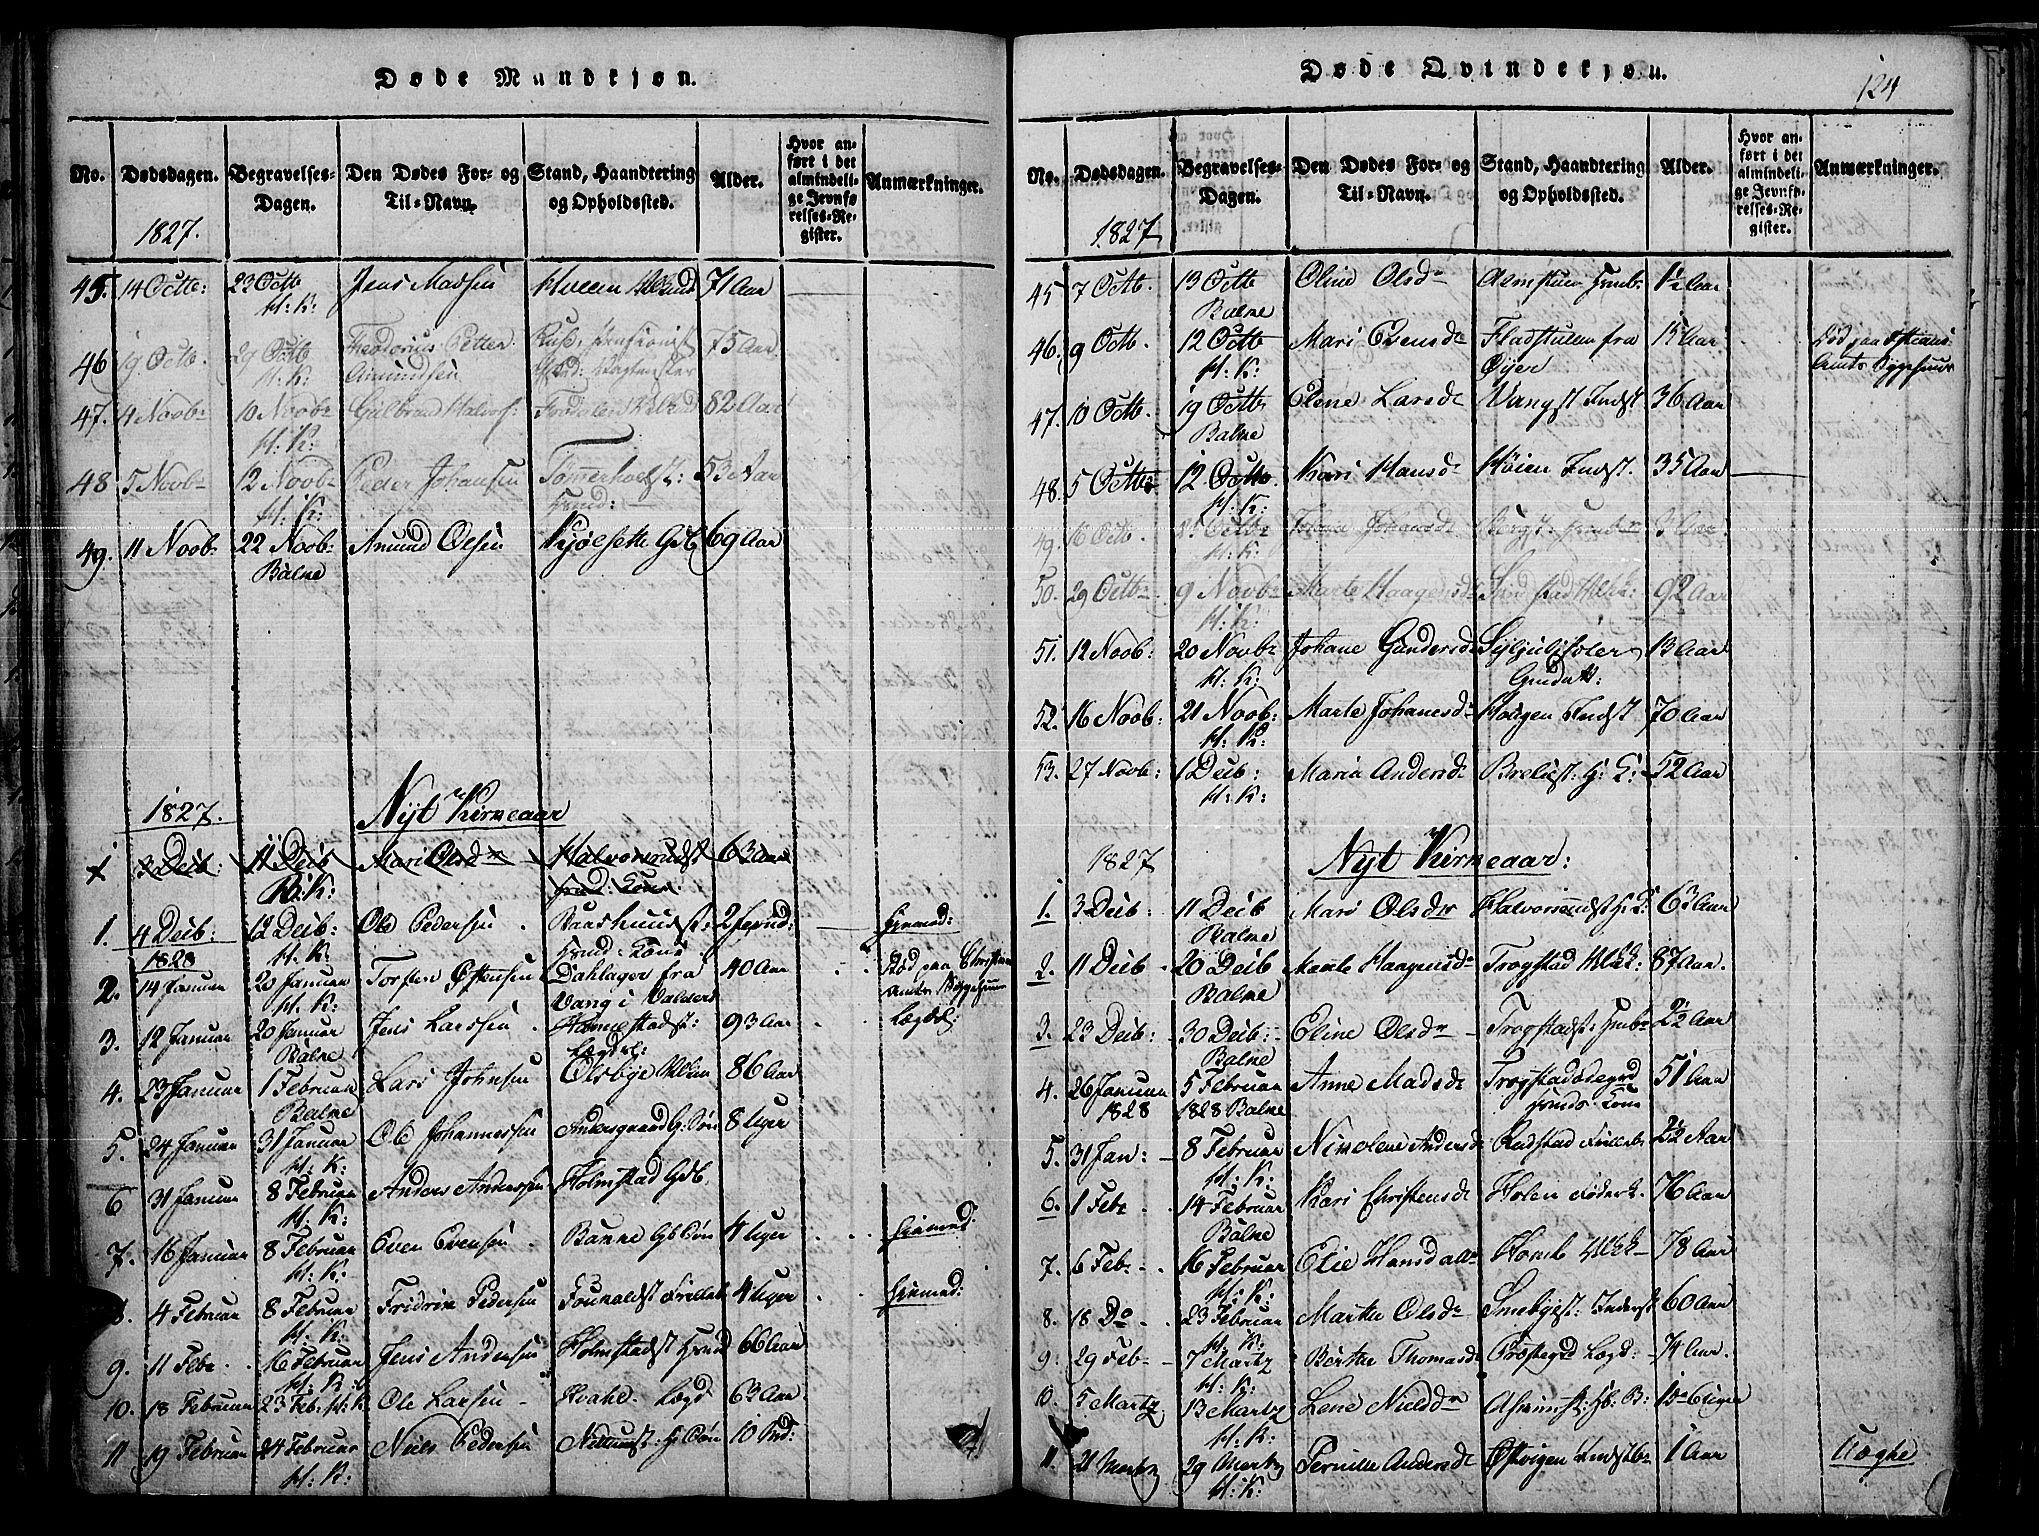 SAH, Toten prestekontor, Ministerialbok nr. 10, 1820-1828, s. 124